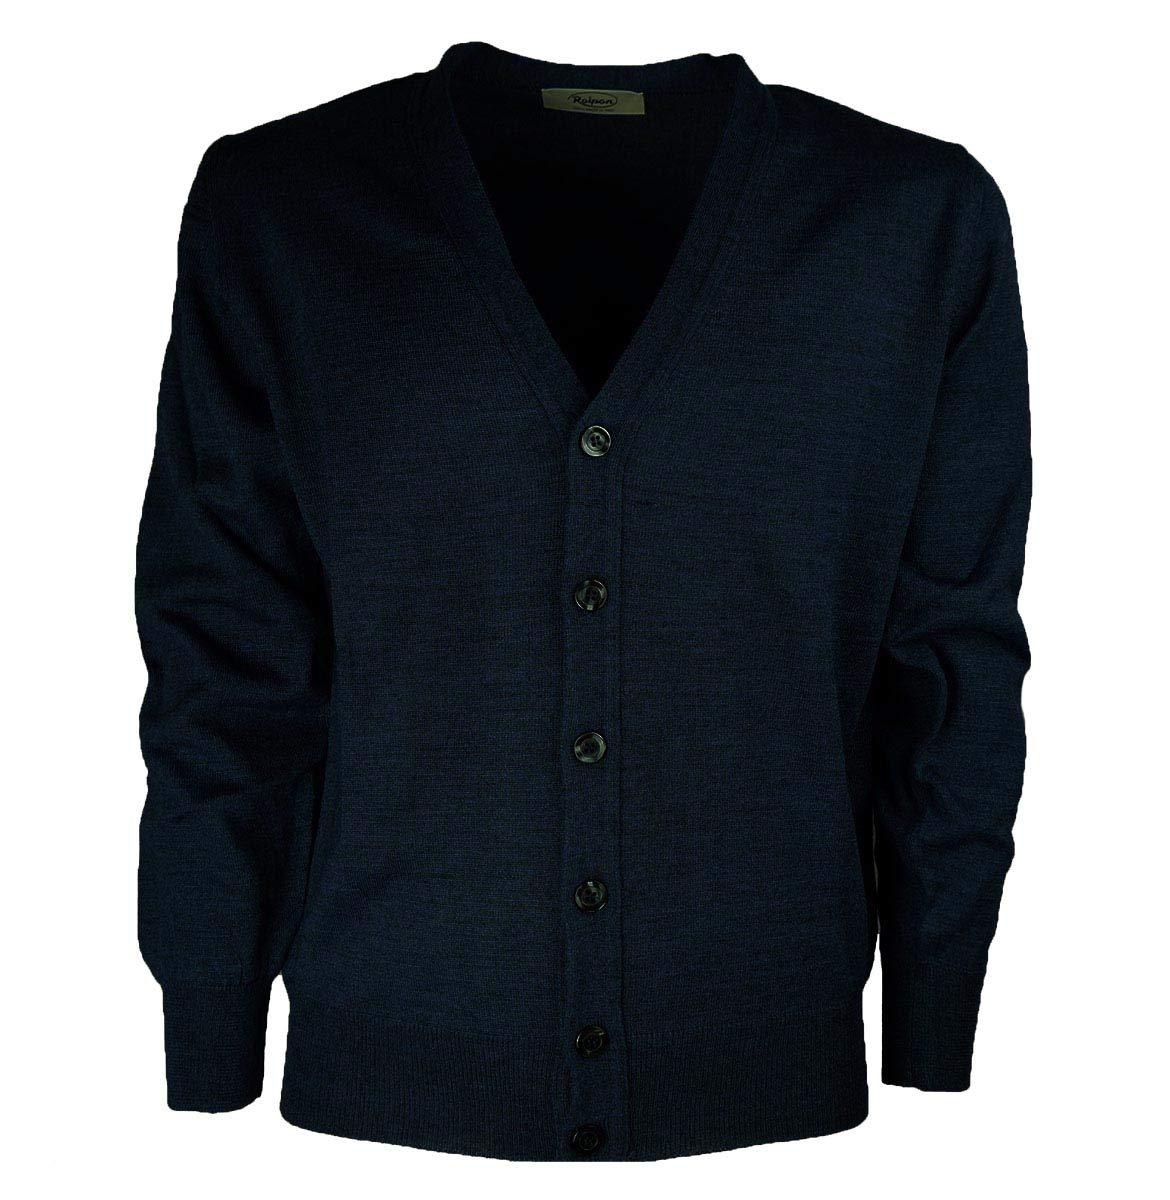 Cardigan da uomo Marchio Goodthreads in lana merino